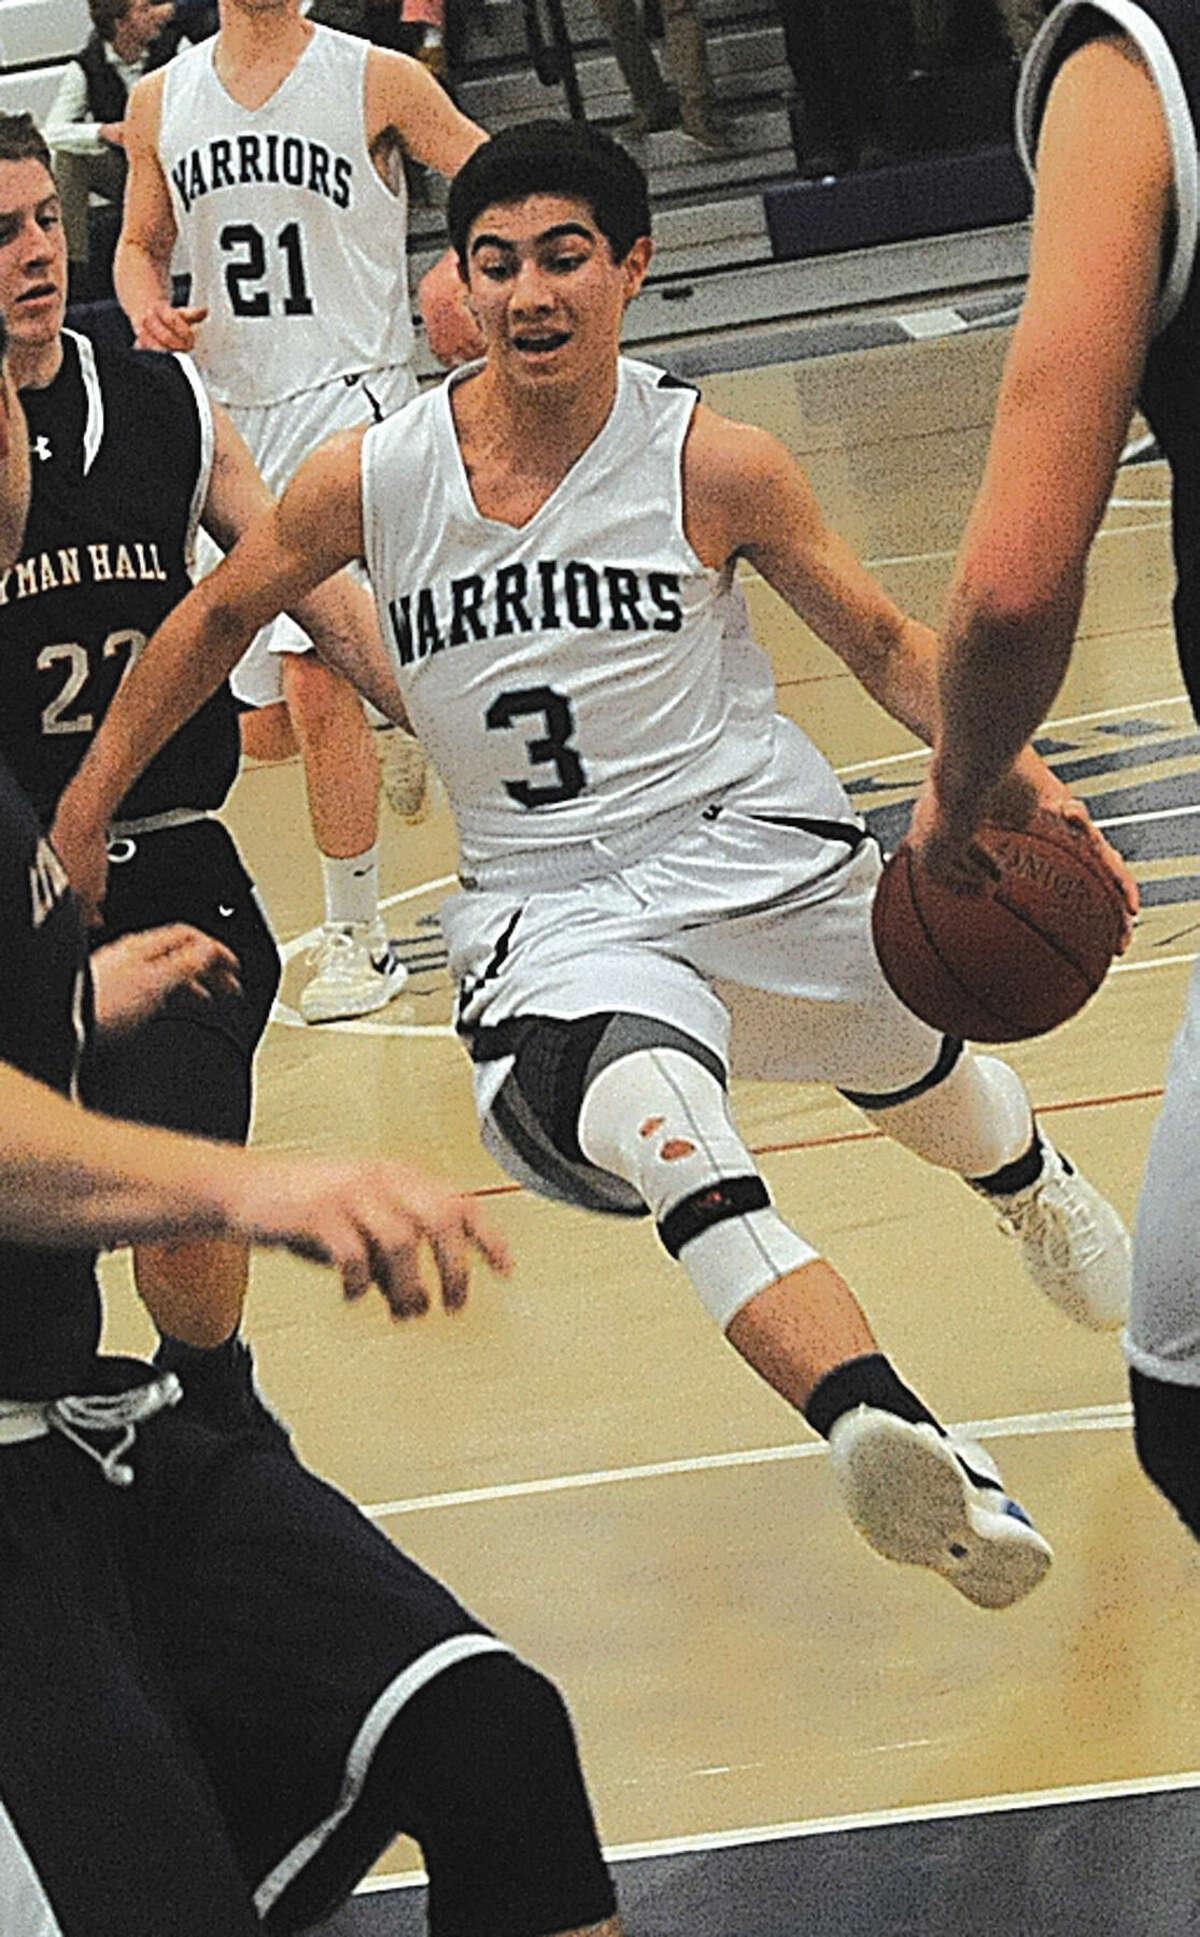 #3 Wilton boys basketball Matt Kronenberg. Hour photo/Matthew Vinci